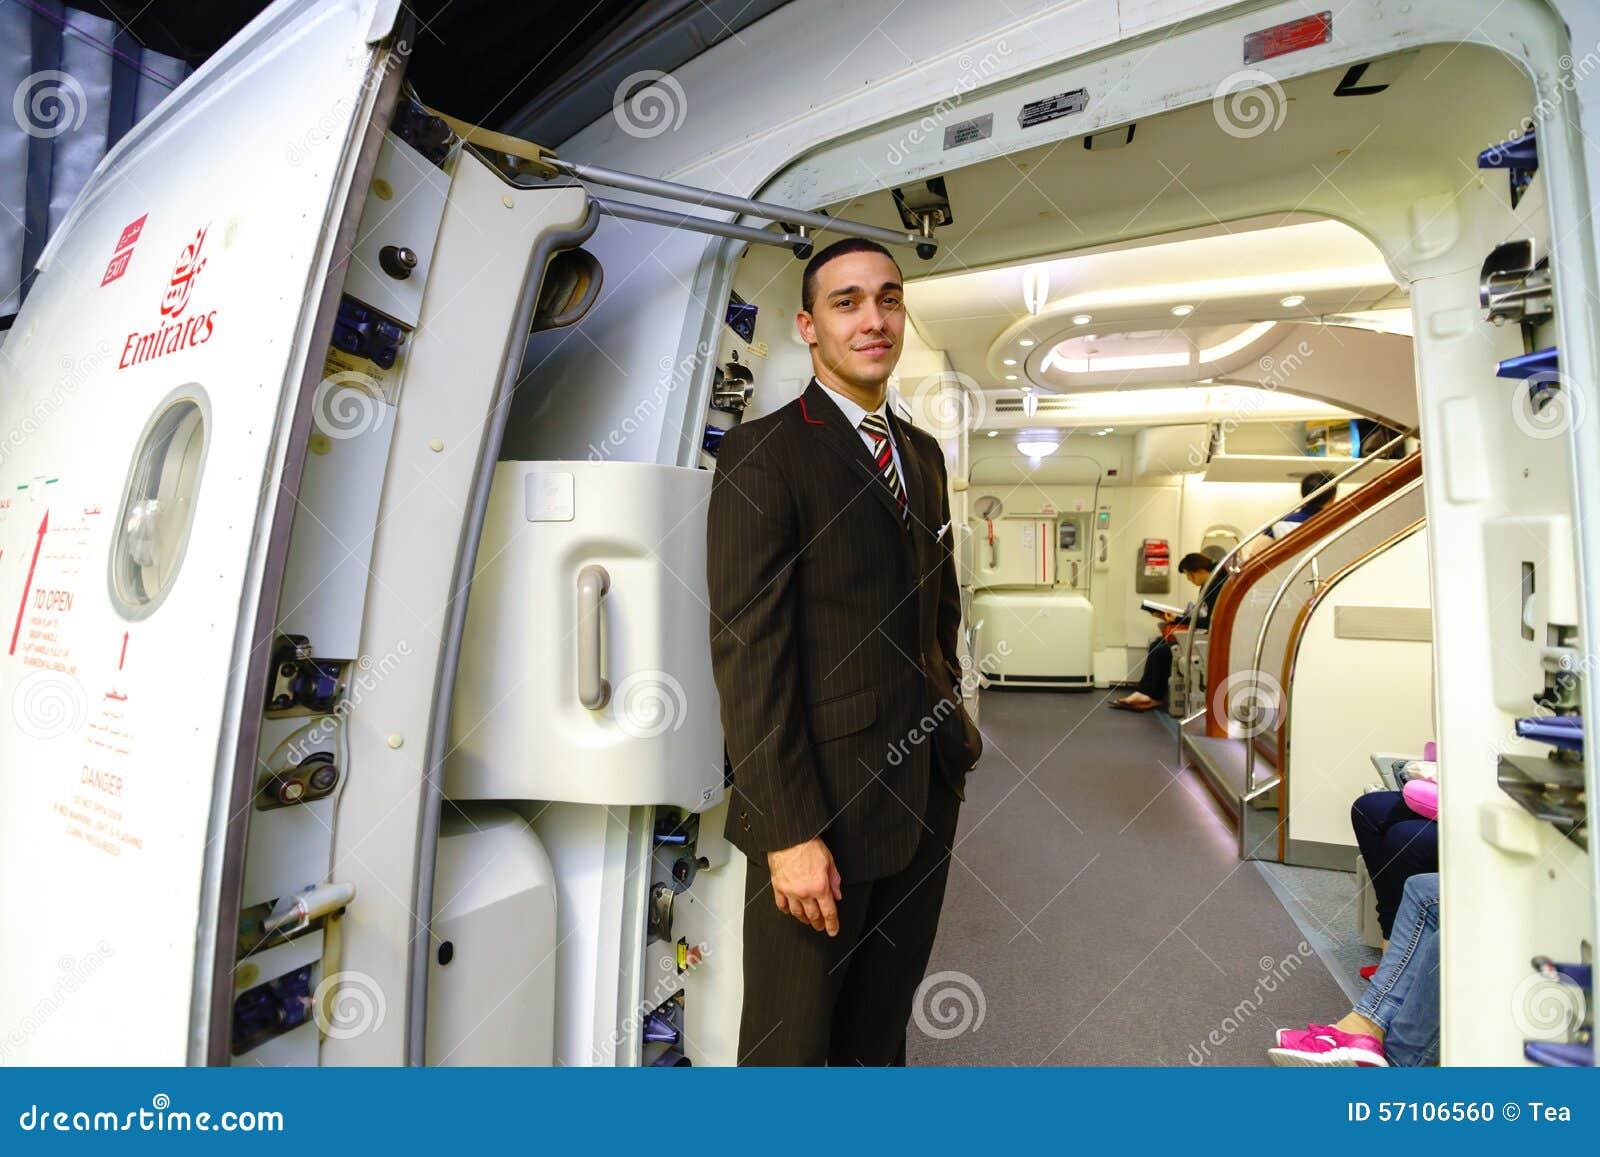 Emirates crew member meet passengers